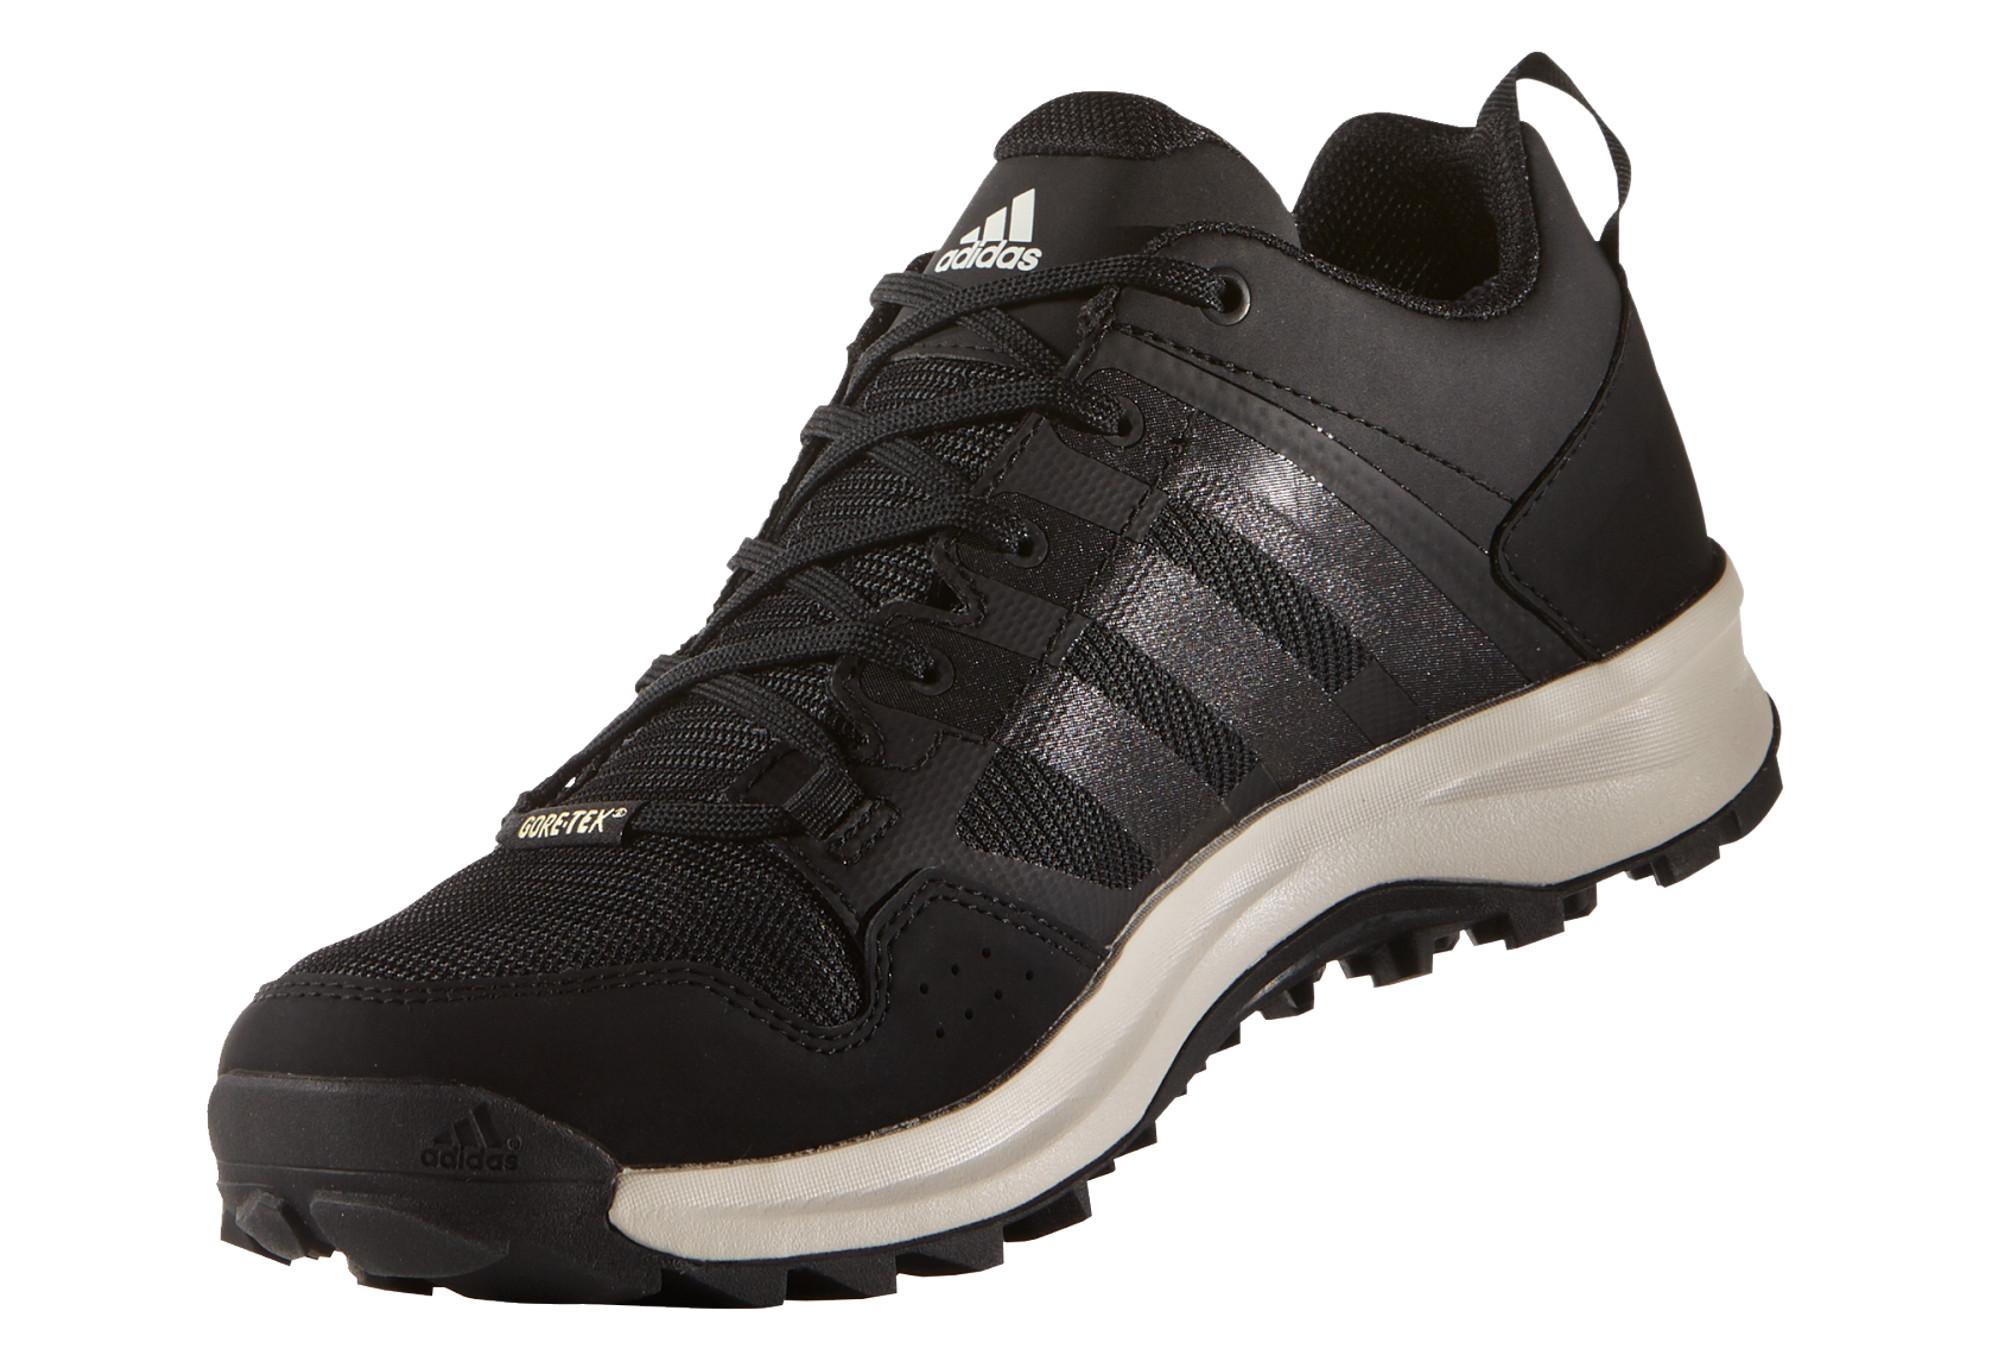 huge selection of 53775 c1db0 Noir Running Zapatillas Kanadia Trail Para Hombre 7 Adidas 0n8nqwCxU4